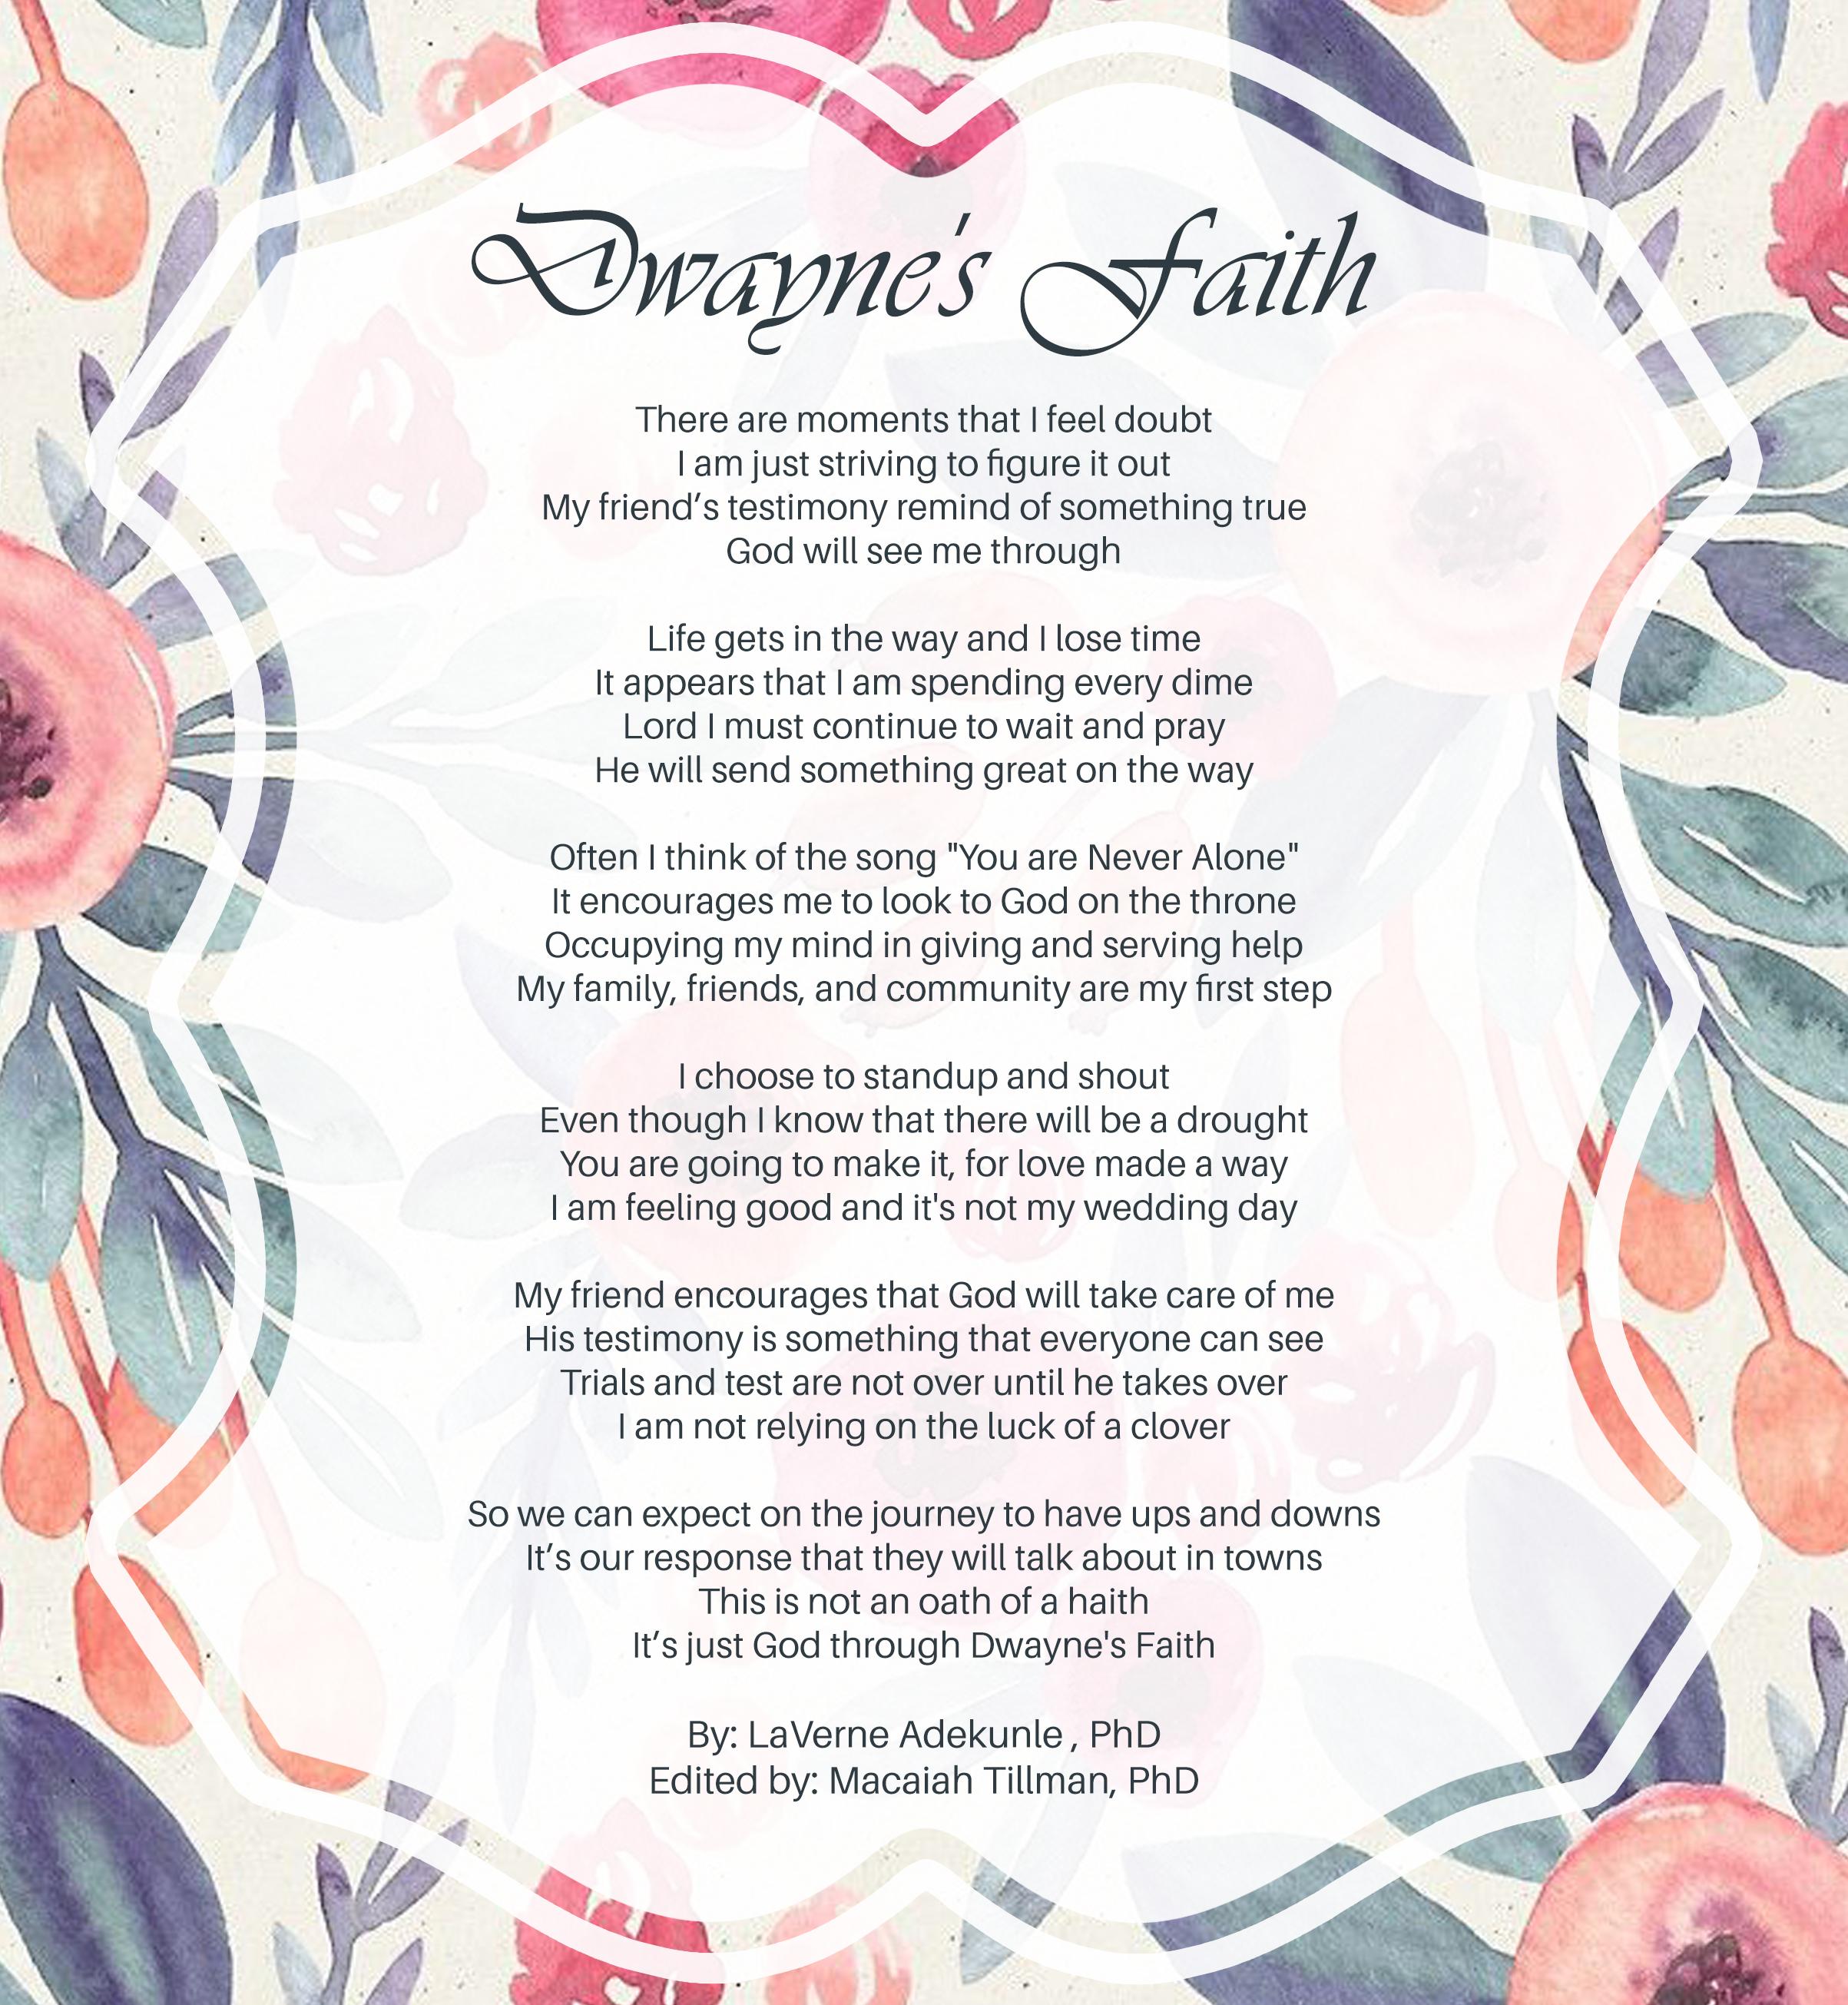 Dwayne's Poem and Music Contest | la Expose'